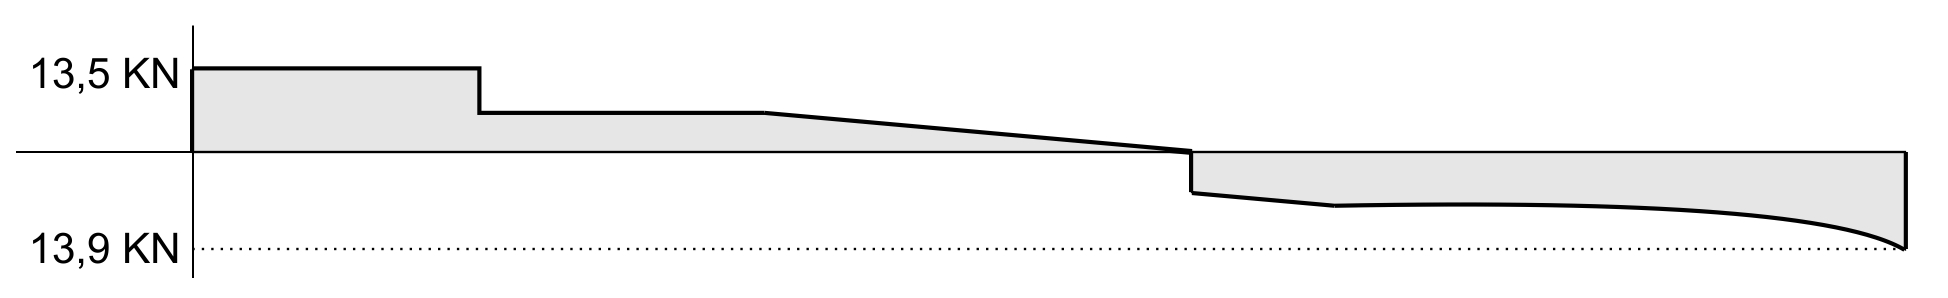 Esforço Cortante - Exemplo 2.8